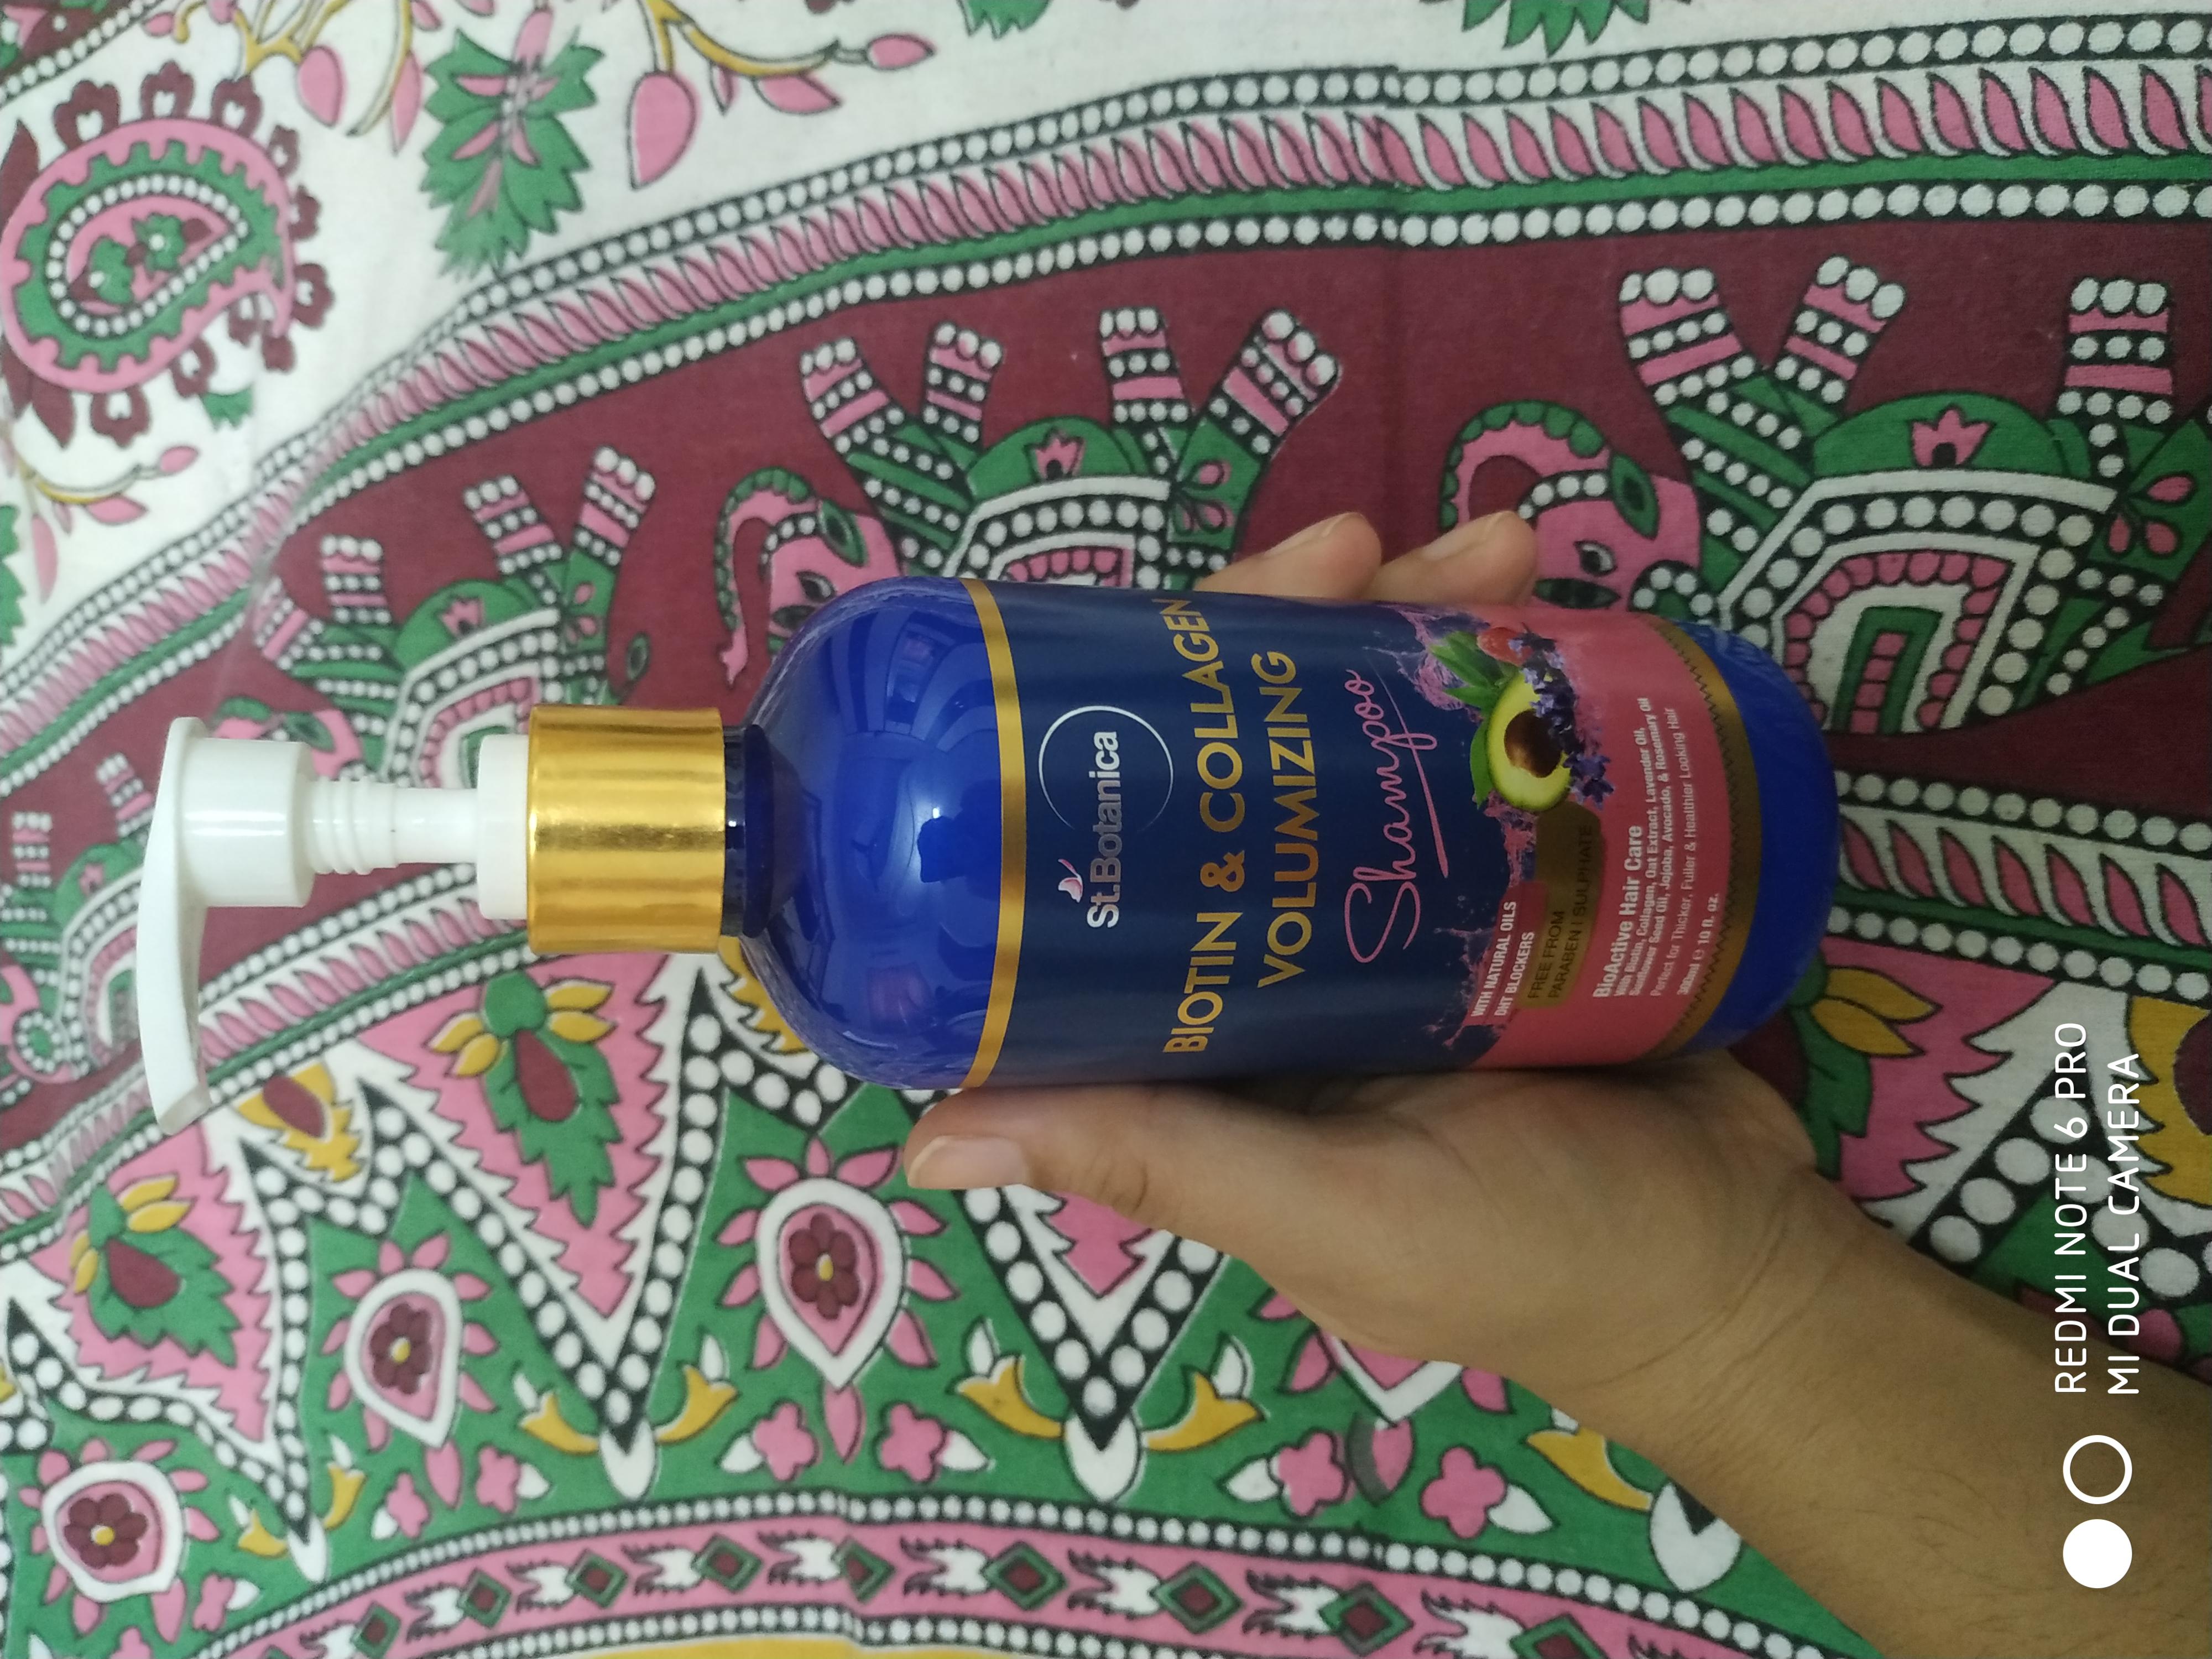 St.Botanica Biotin & Collagen Volumizing Hair Shampoo-Bouncy hair-By taniyajoshi13